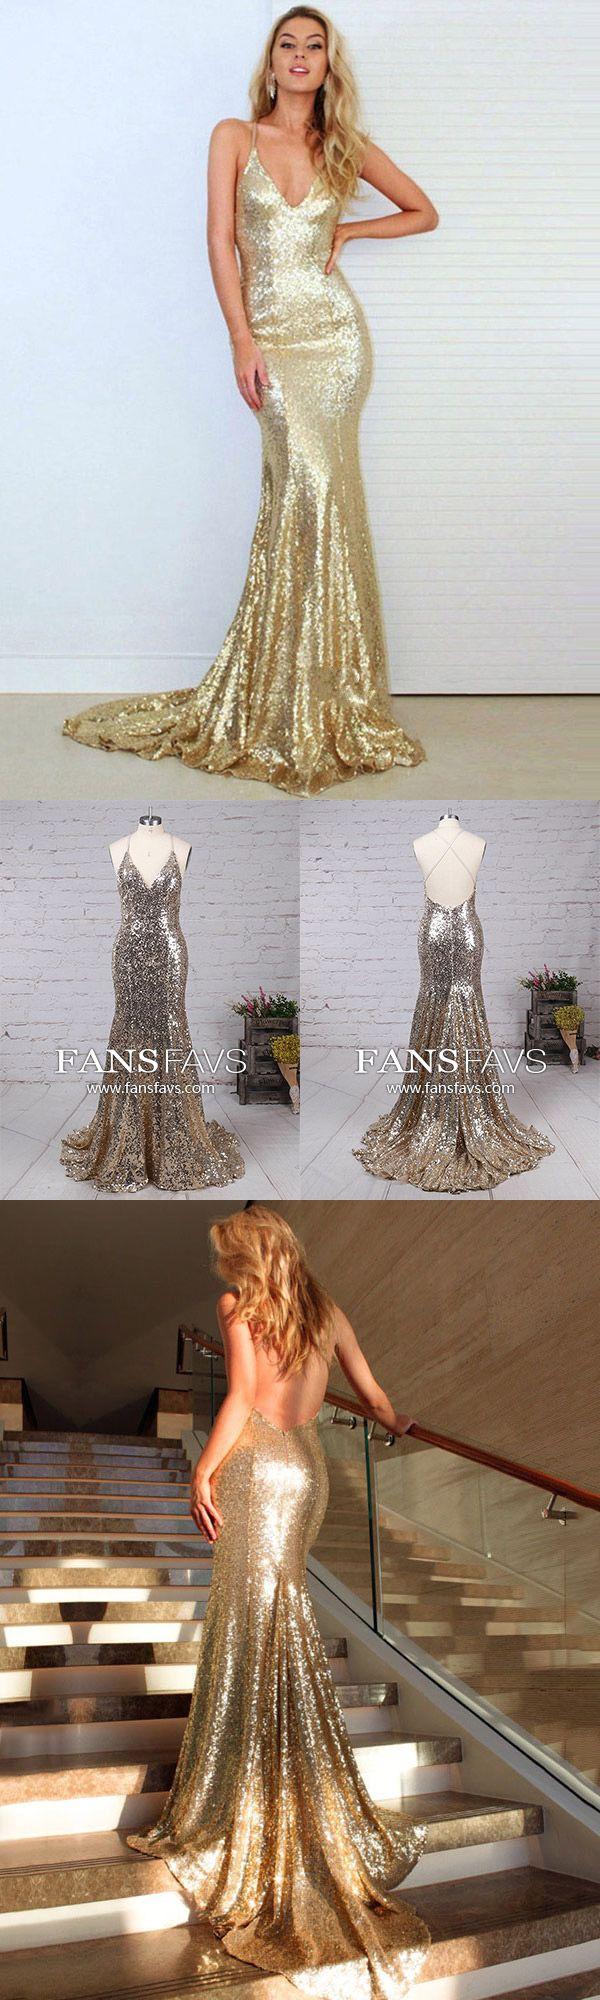 Gold prom dresses sparklylong prom dresses mermaidsexy prom